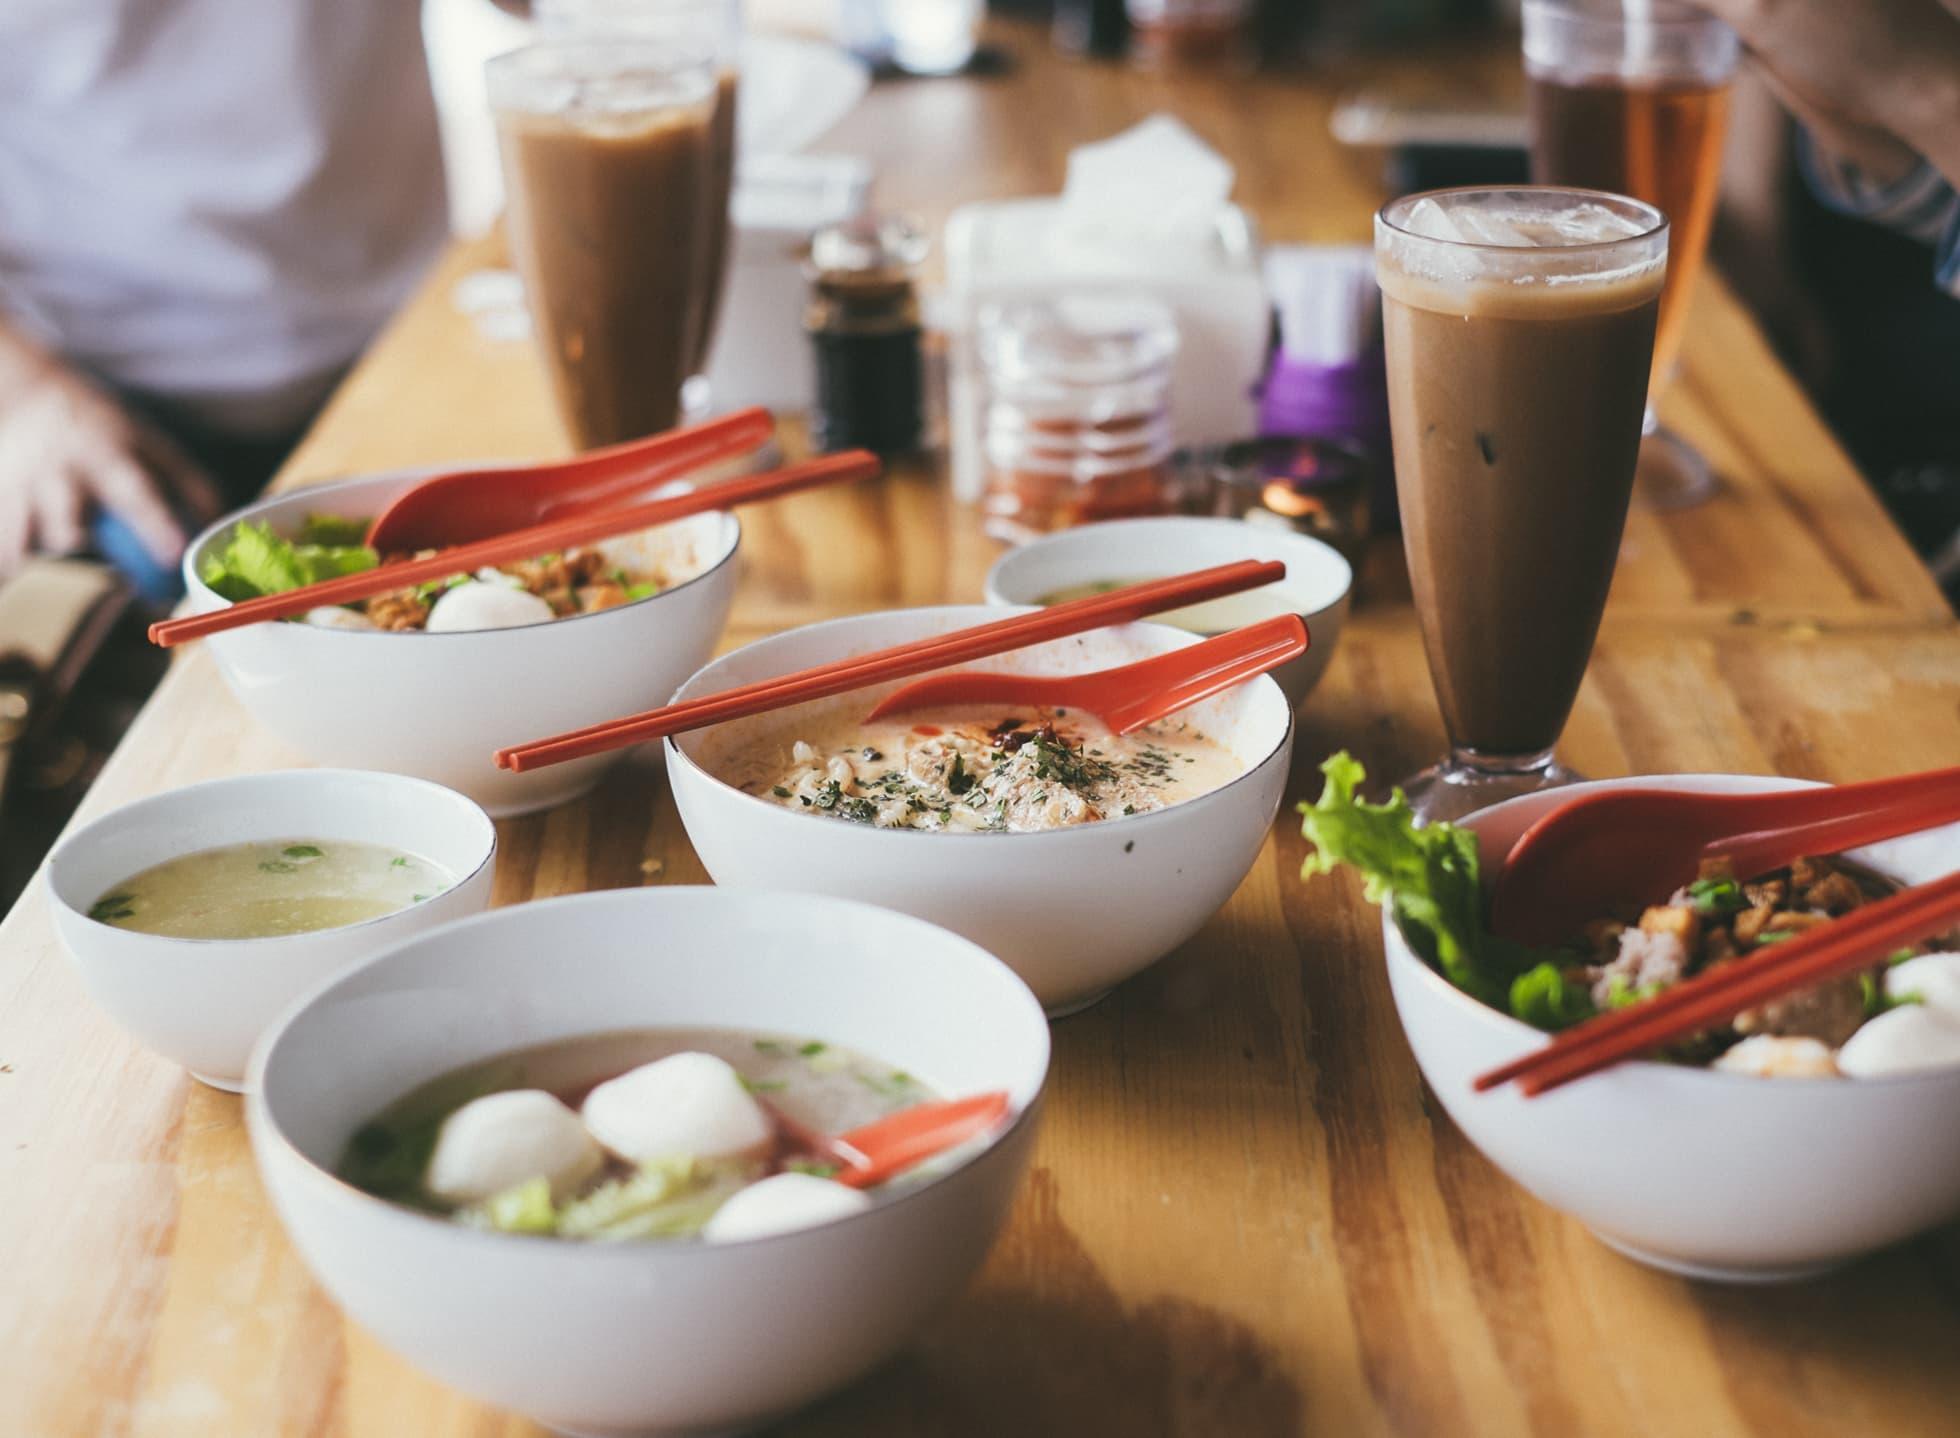 Ming Fa's Affable Noodles